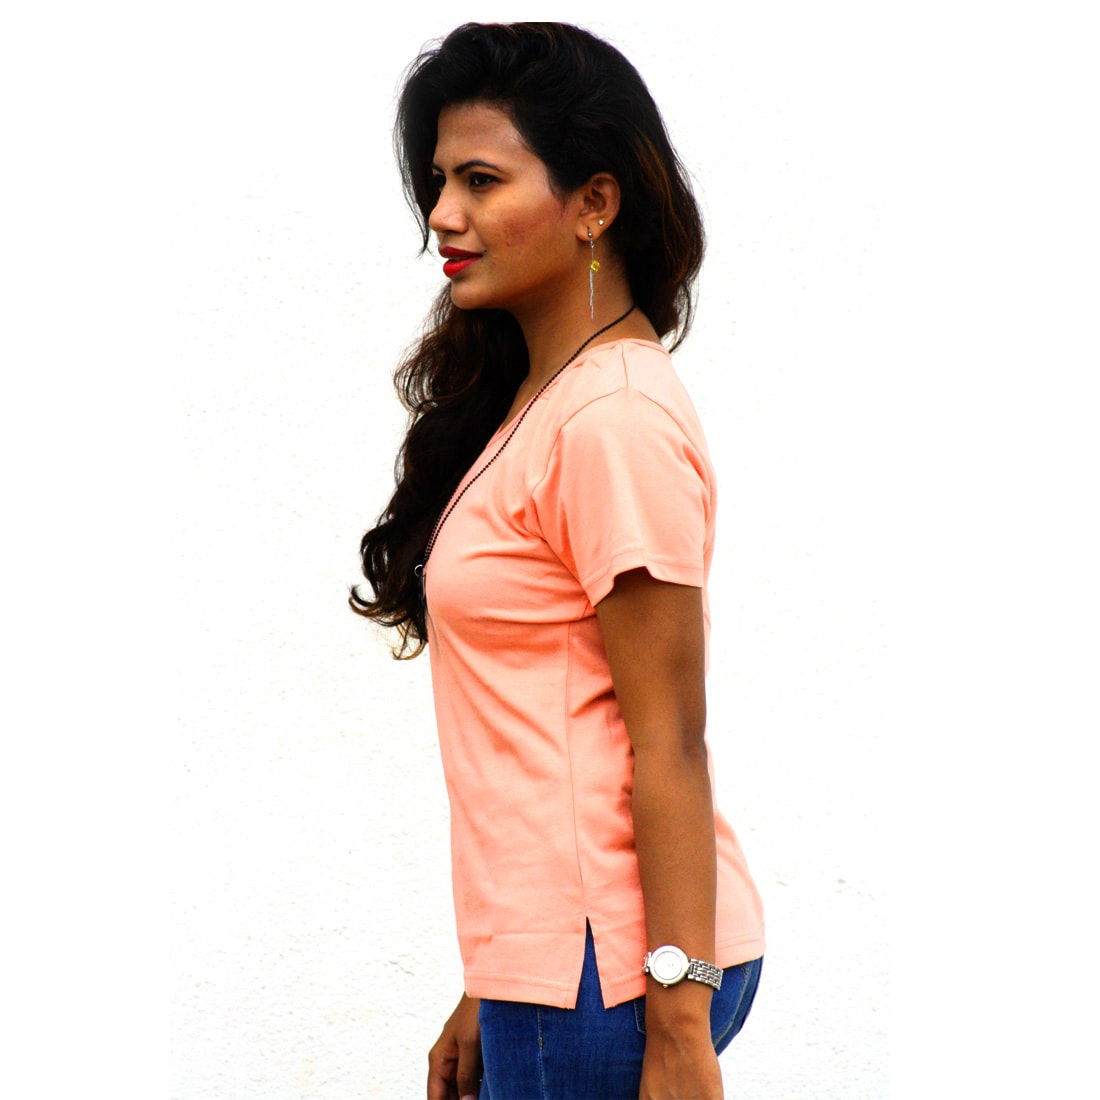 Wiluminaty Organic Cotton V-neck Ladies T-shirt - Orange (3XL)